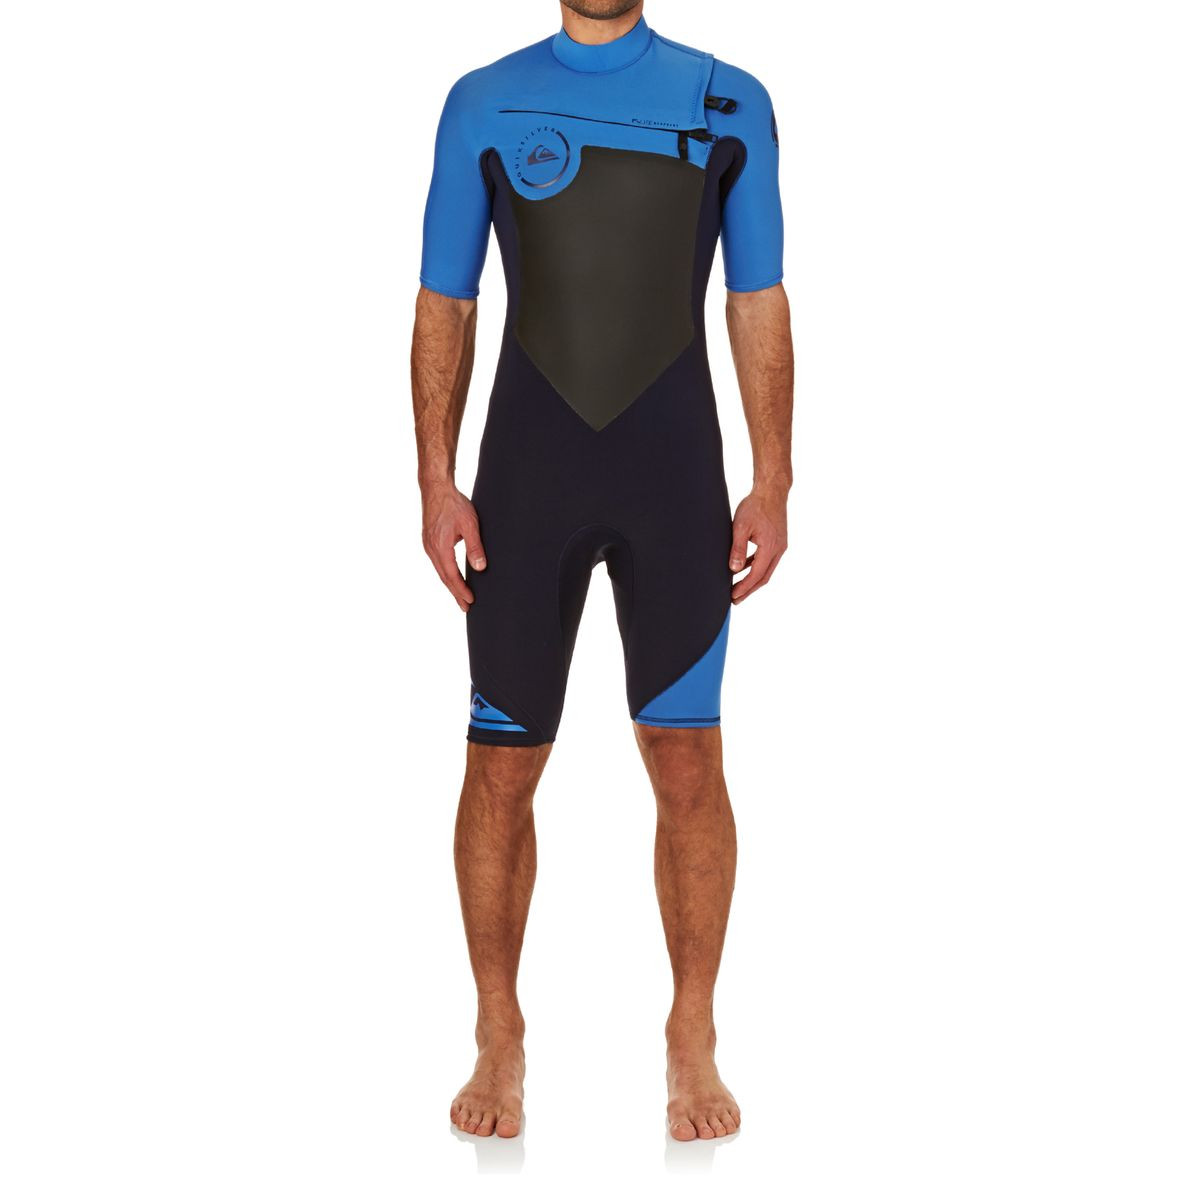 Quiksilver Syncro 2mm 2017 Chest Zip Shorty Wetsuit - Navy Blazer